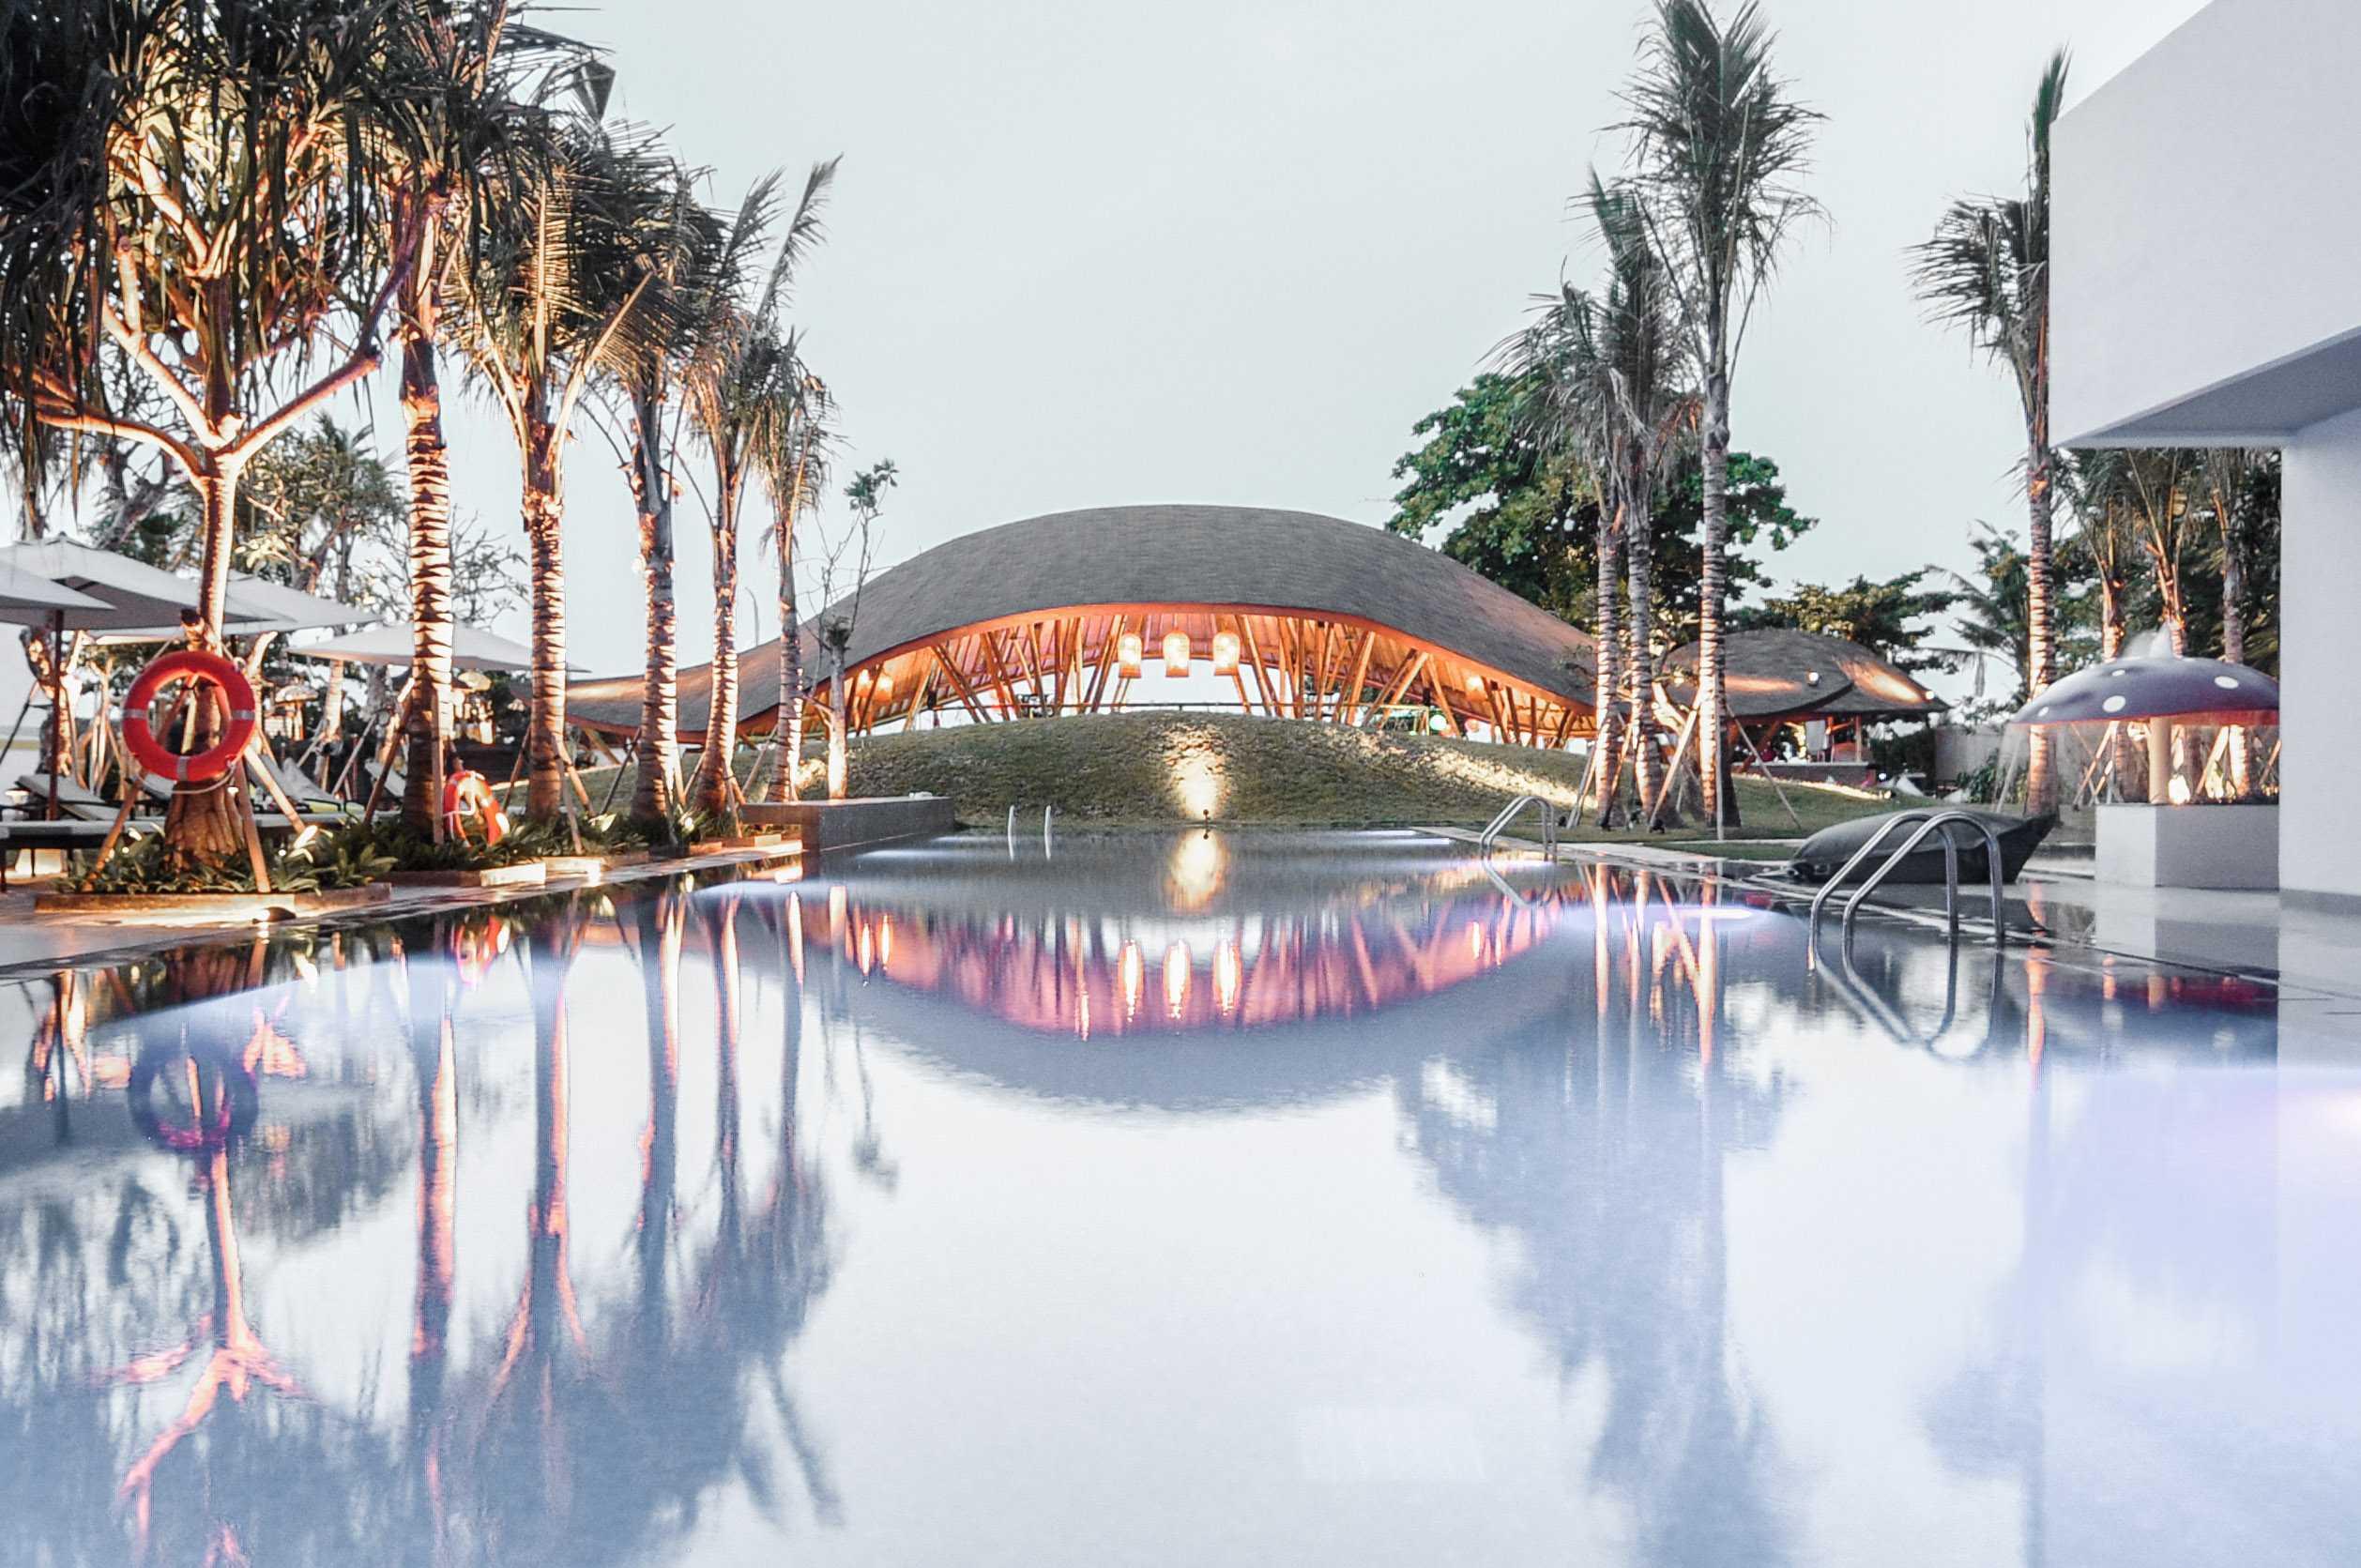 Arkana Architects Warung Bamboo Jl. Pratama No.62E, Benoa, Kuta Sel., Kabupaten Badung, Bali 80361, Indonesia Jl. Pratama No.62E, Benoa, Kuta Sel., Kabupaten Badung, Bali 80361, Indonesia Arkana-Architects-Warung-Bamboo   58287